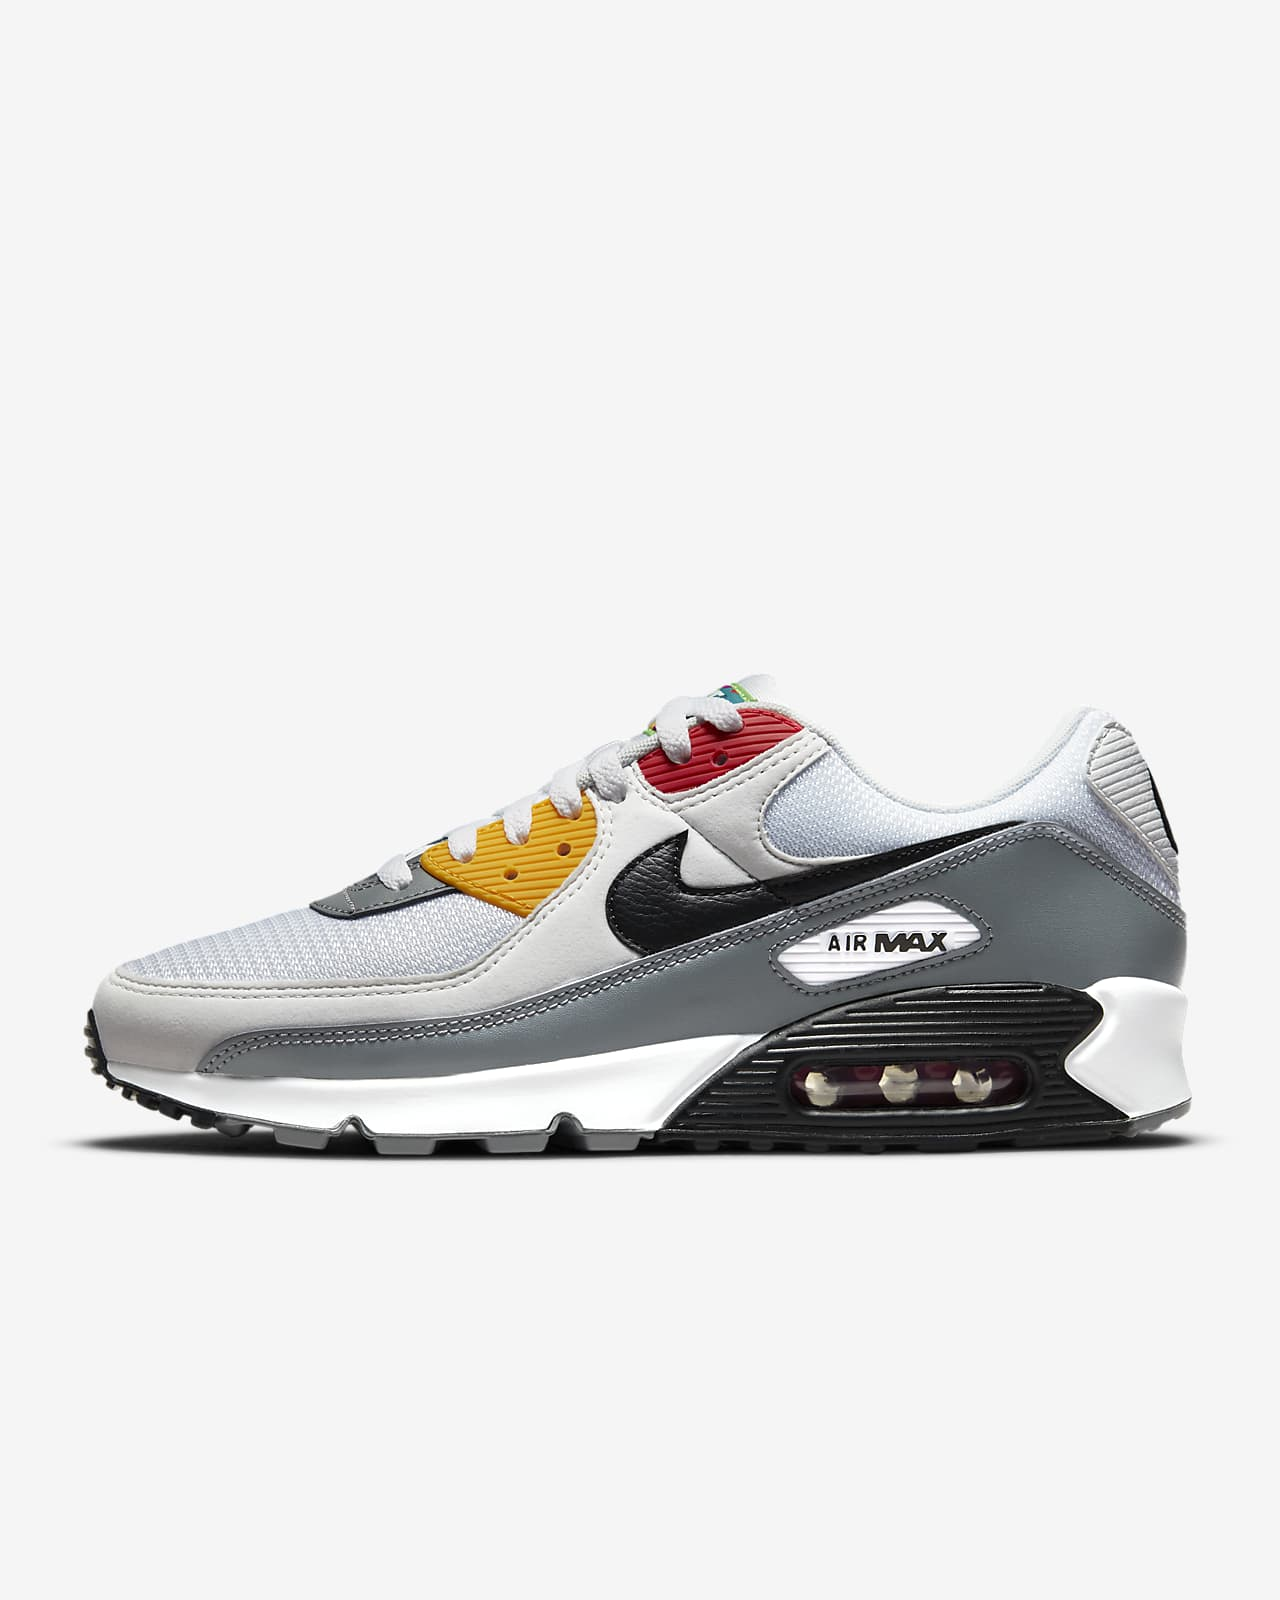 Pánská bota Nike Air Max 90 Premium